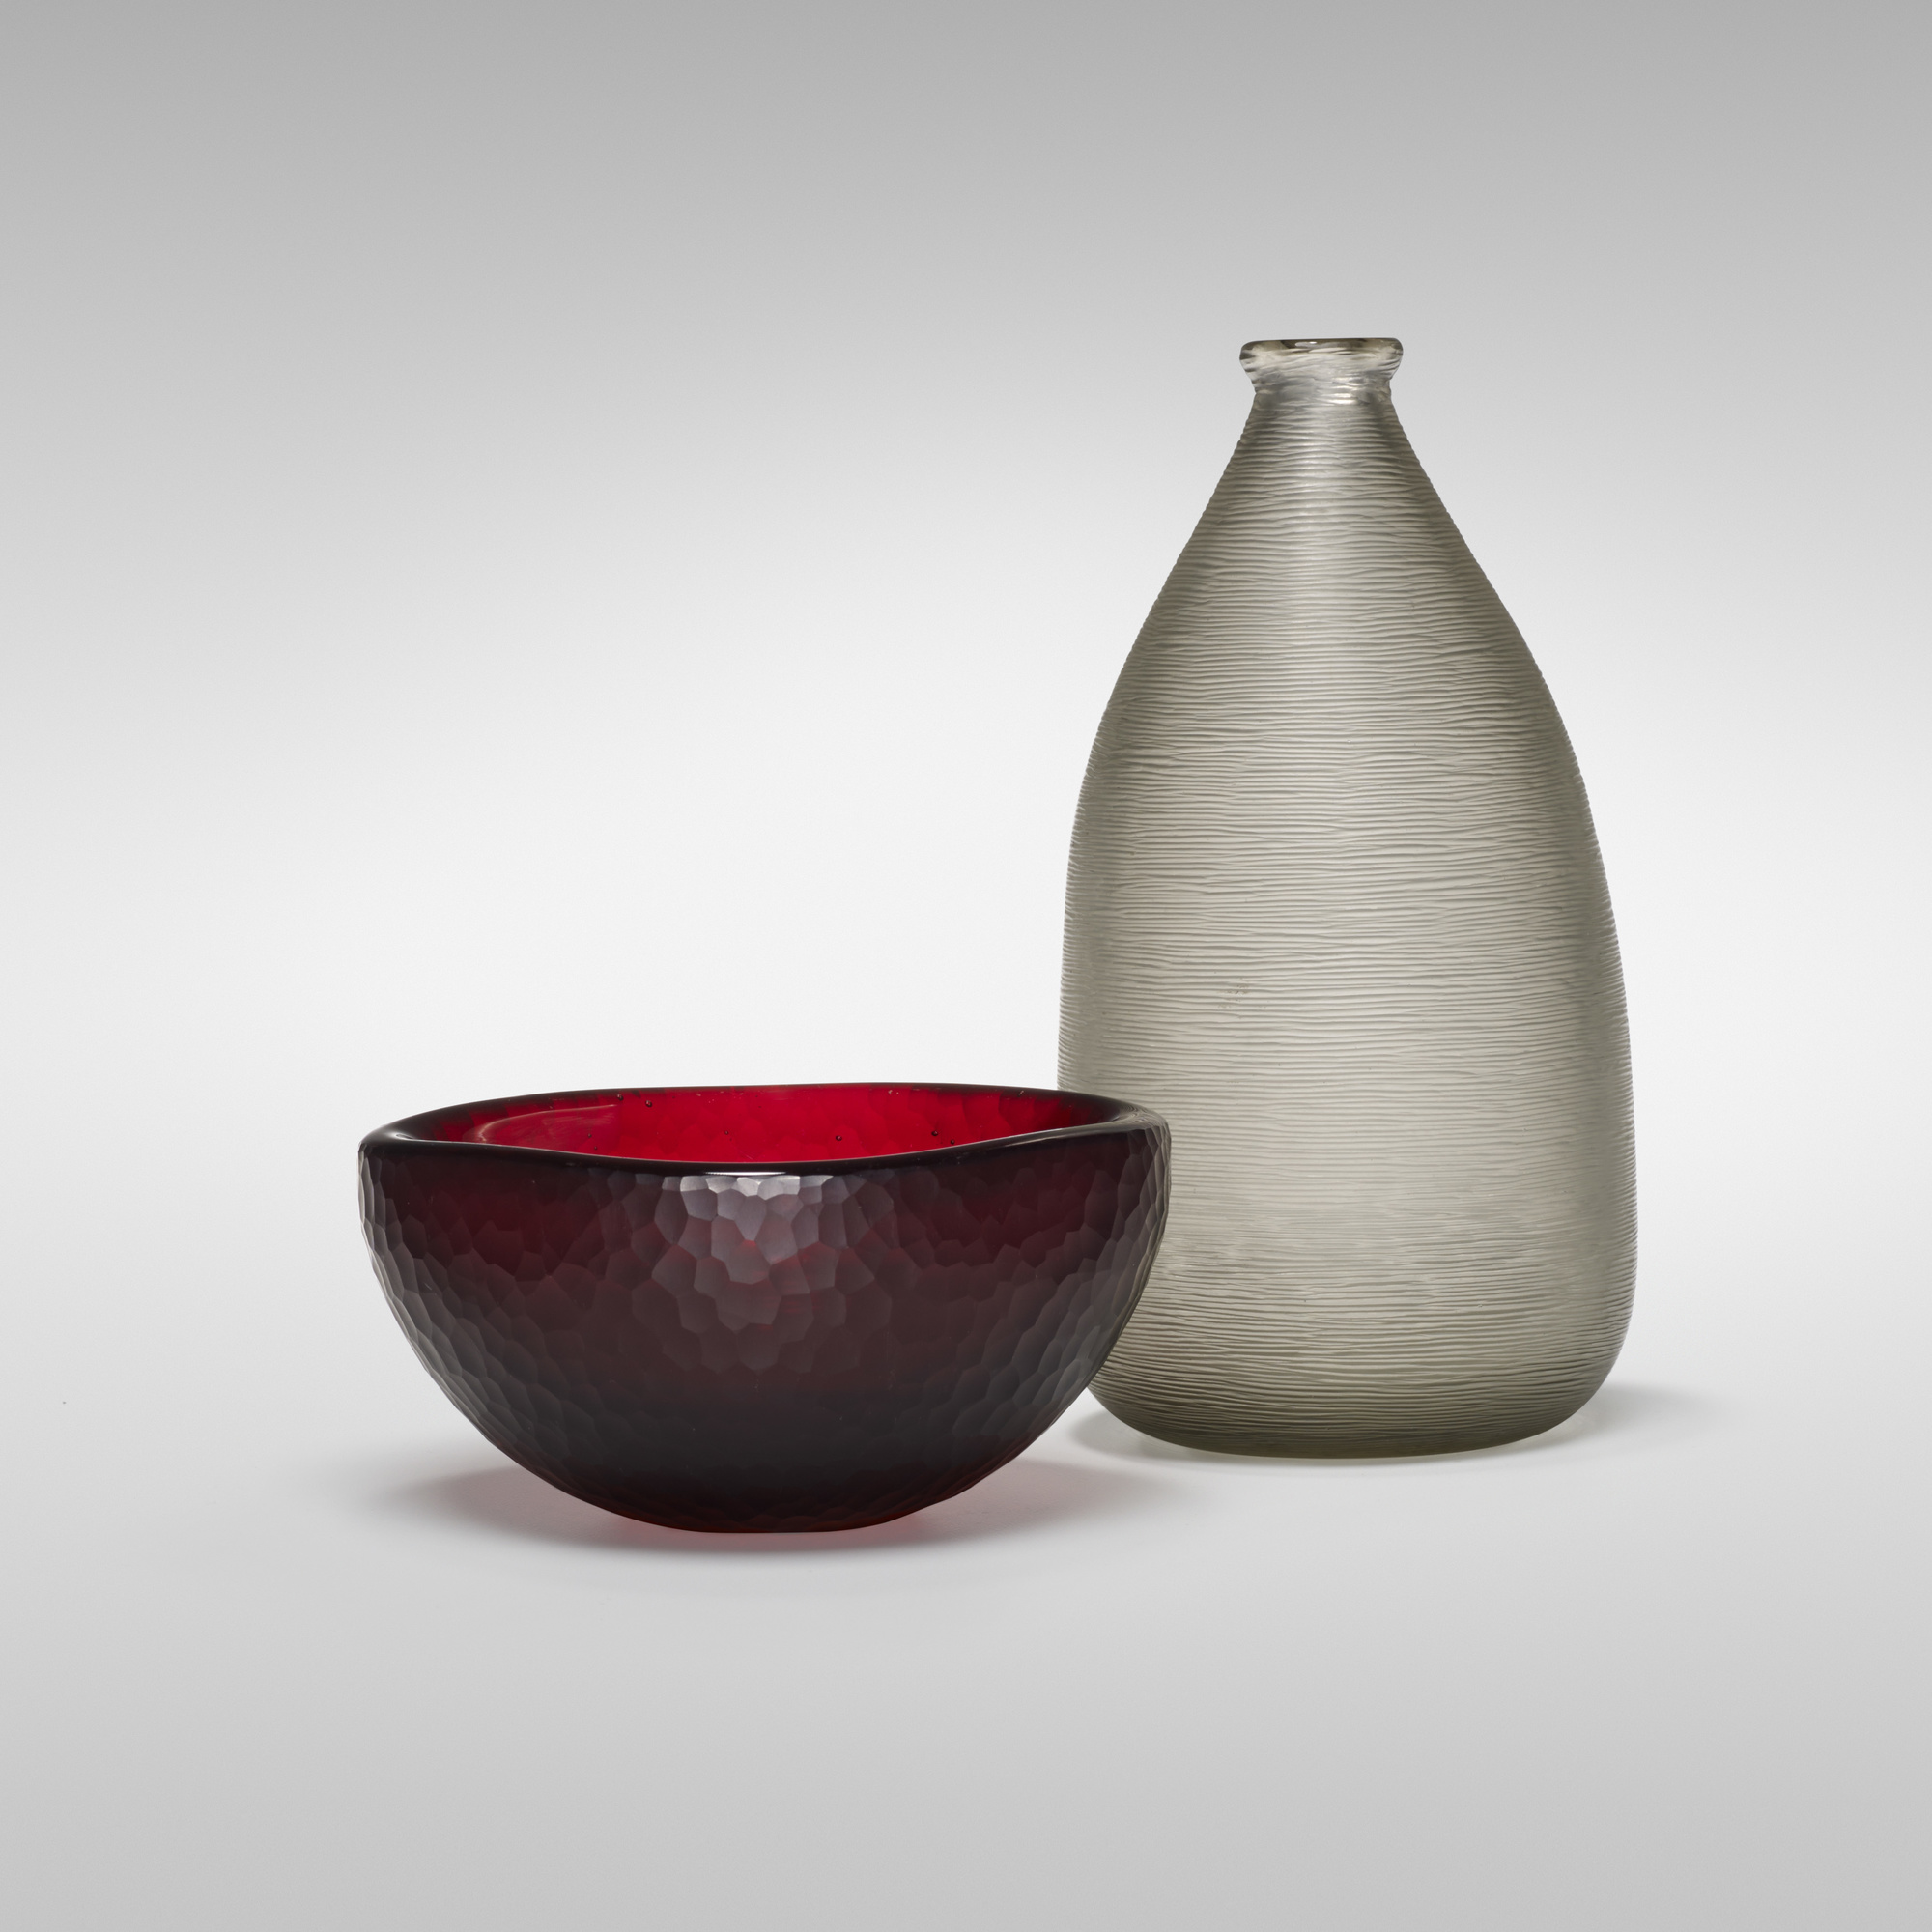 146 carlo scarpa inciso vase important italian glass 20 may 146 carlo scarpa inciso vase 2 of 2 floridaeventfo Image collections